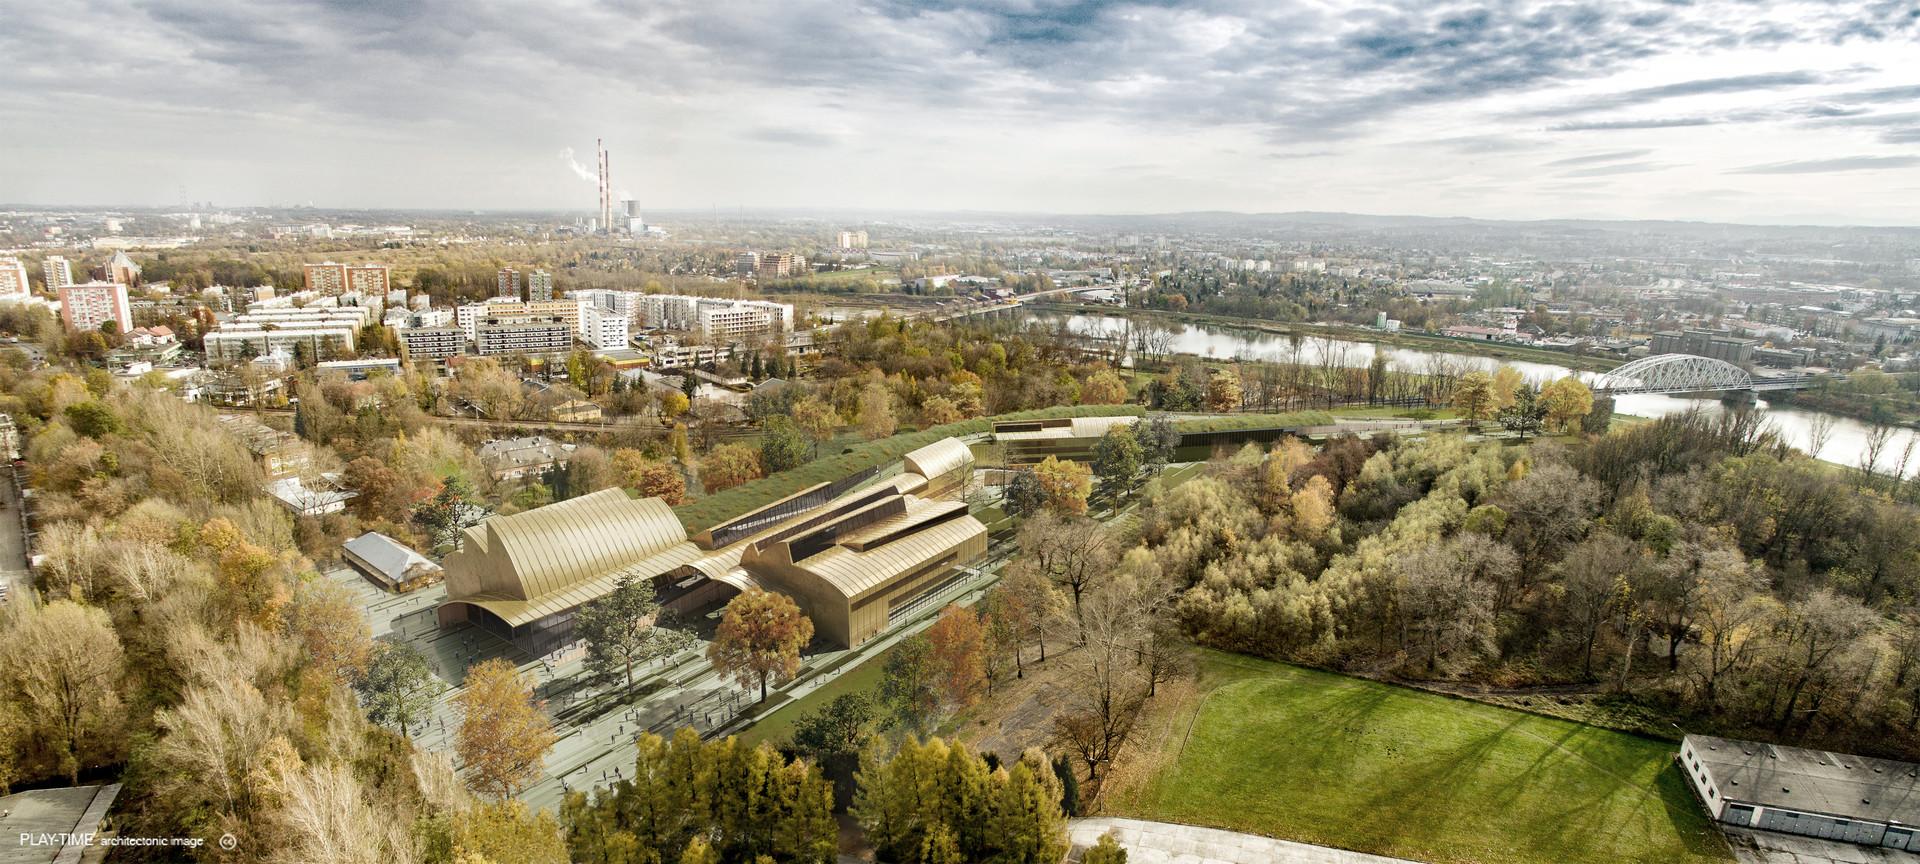 Play time architectonic image eovastudio conservatory in crackovia 02